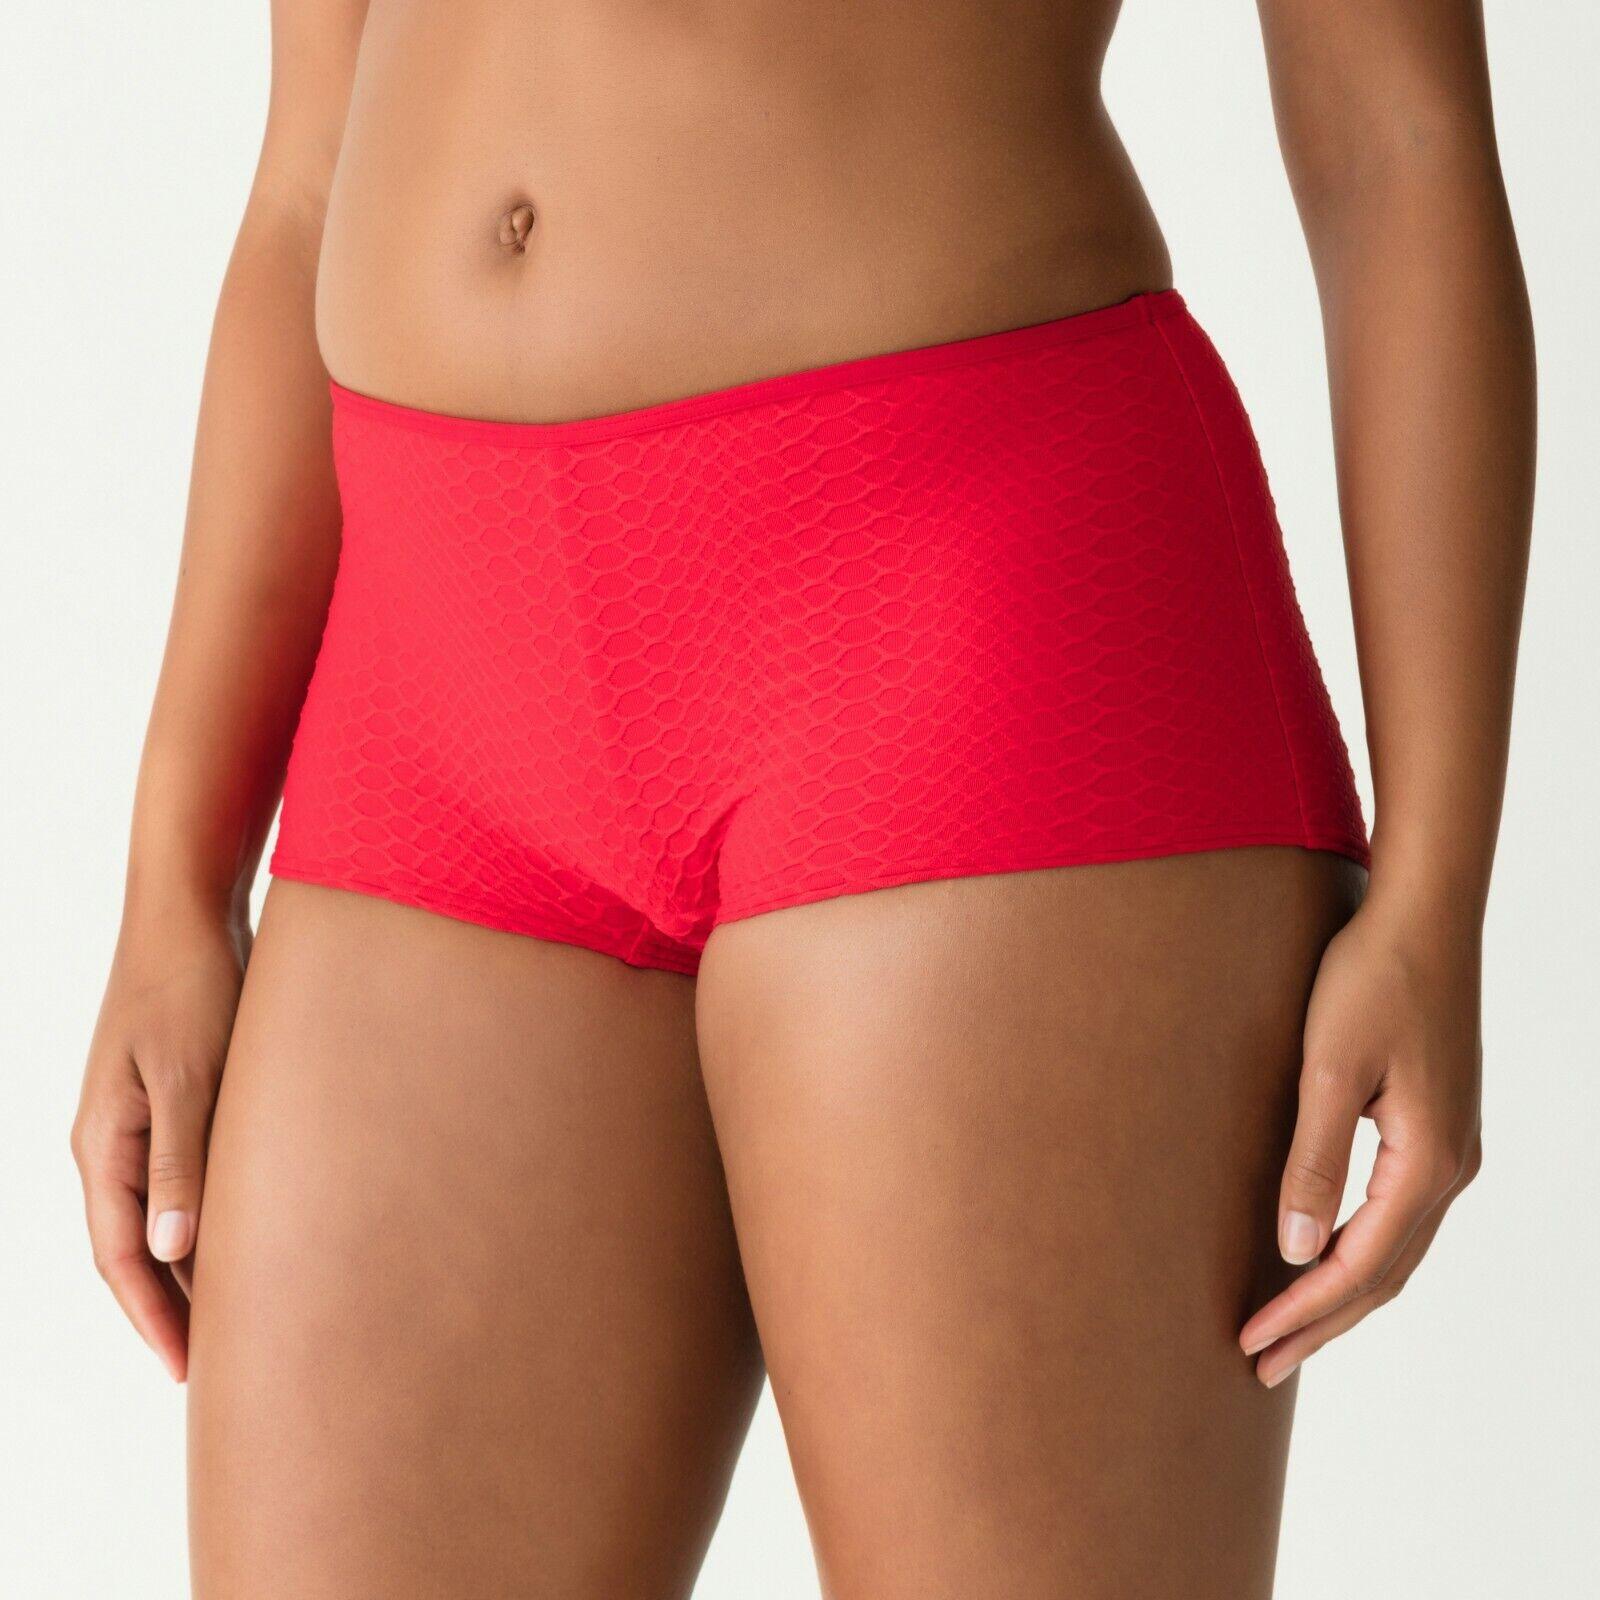 Prima damen Swim Bikini Shorty Shorty Shorty Canyon Rot True rot Slip Hose Bademode Shorts | Sofortige Lieferung  | Ausgezeichnete Leistung  | Online Kaufen  e68789